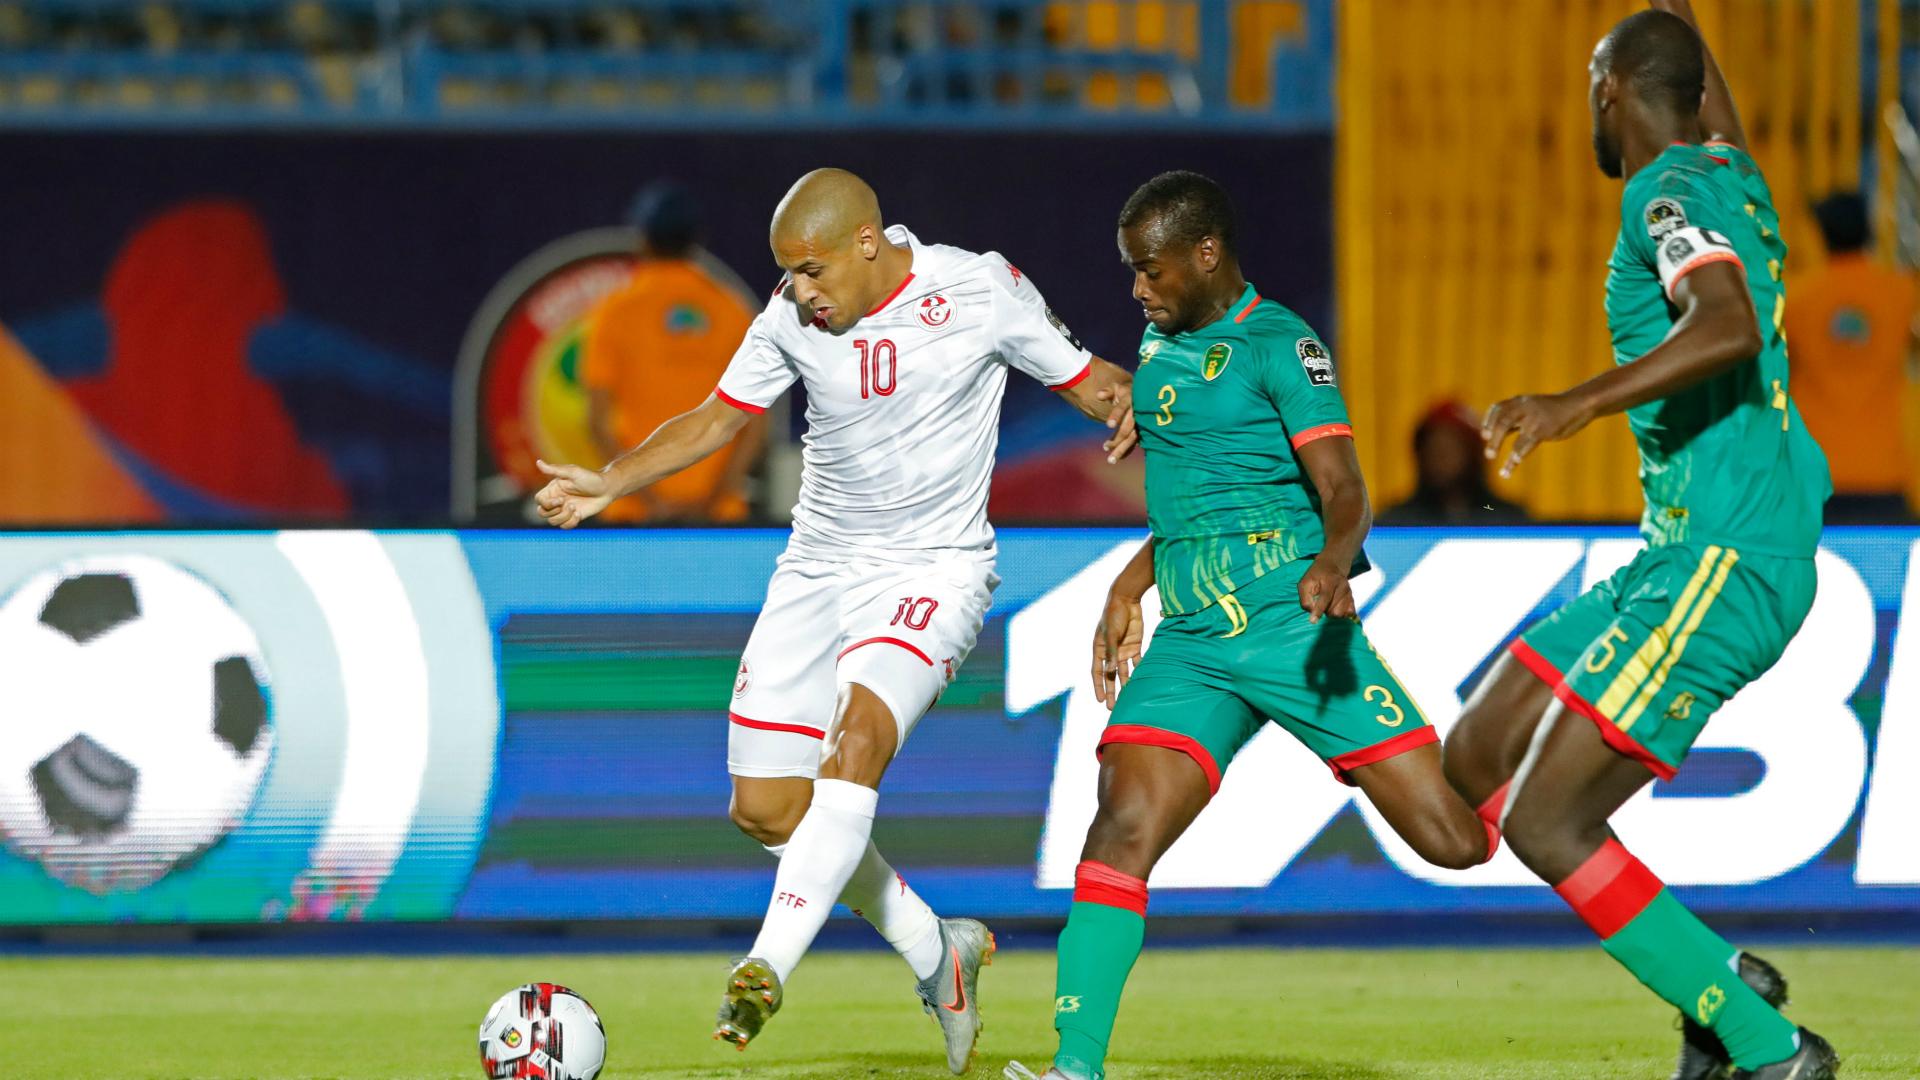 Mauritania vs tunisia betting expert sports supabets sports betting rules in las vegas